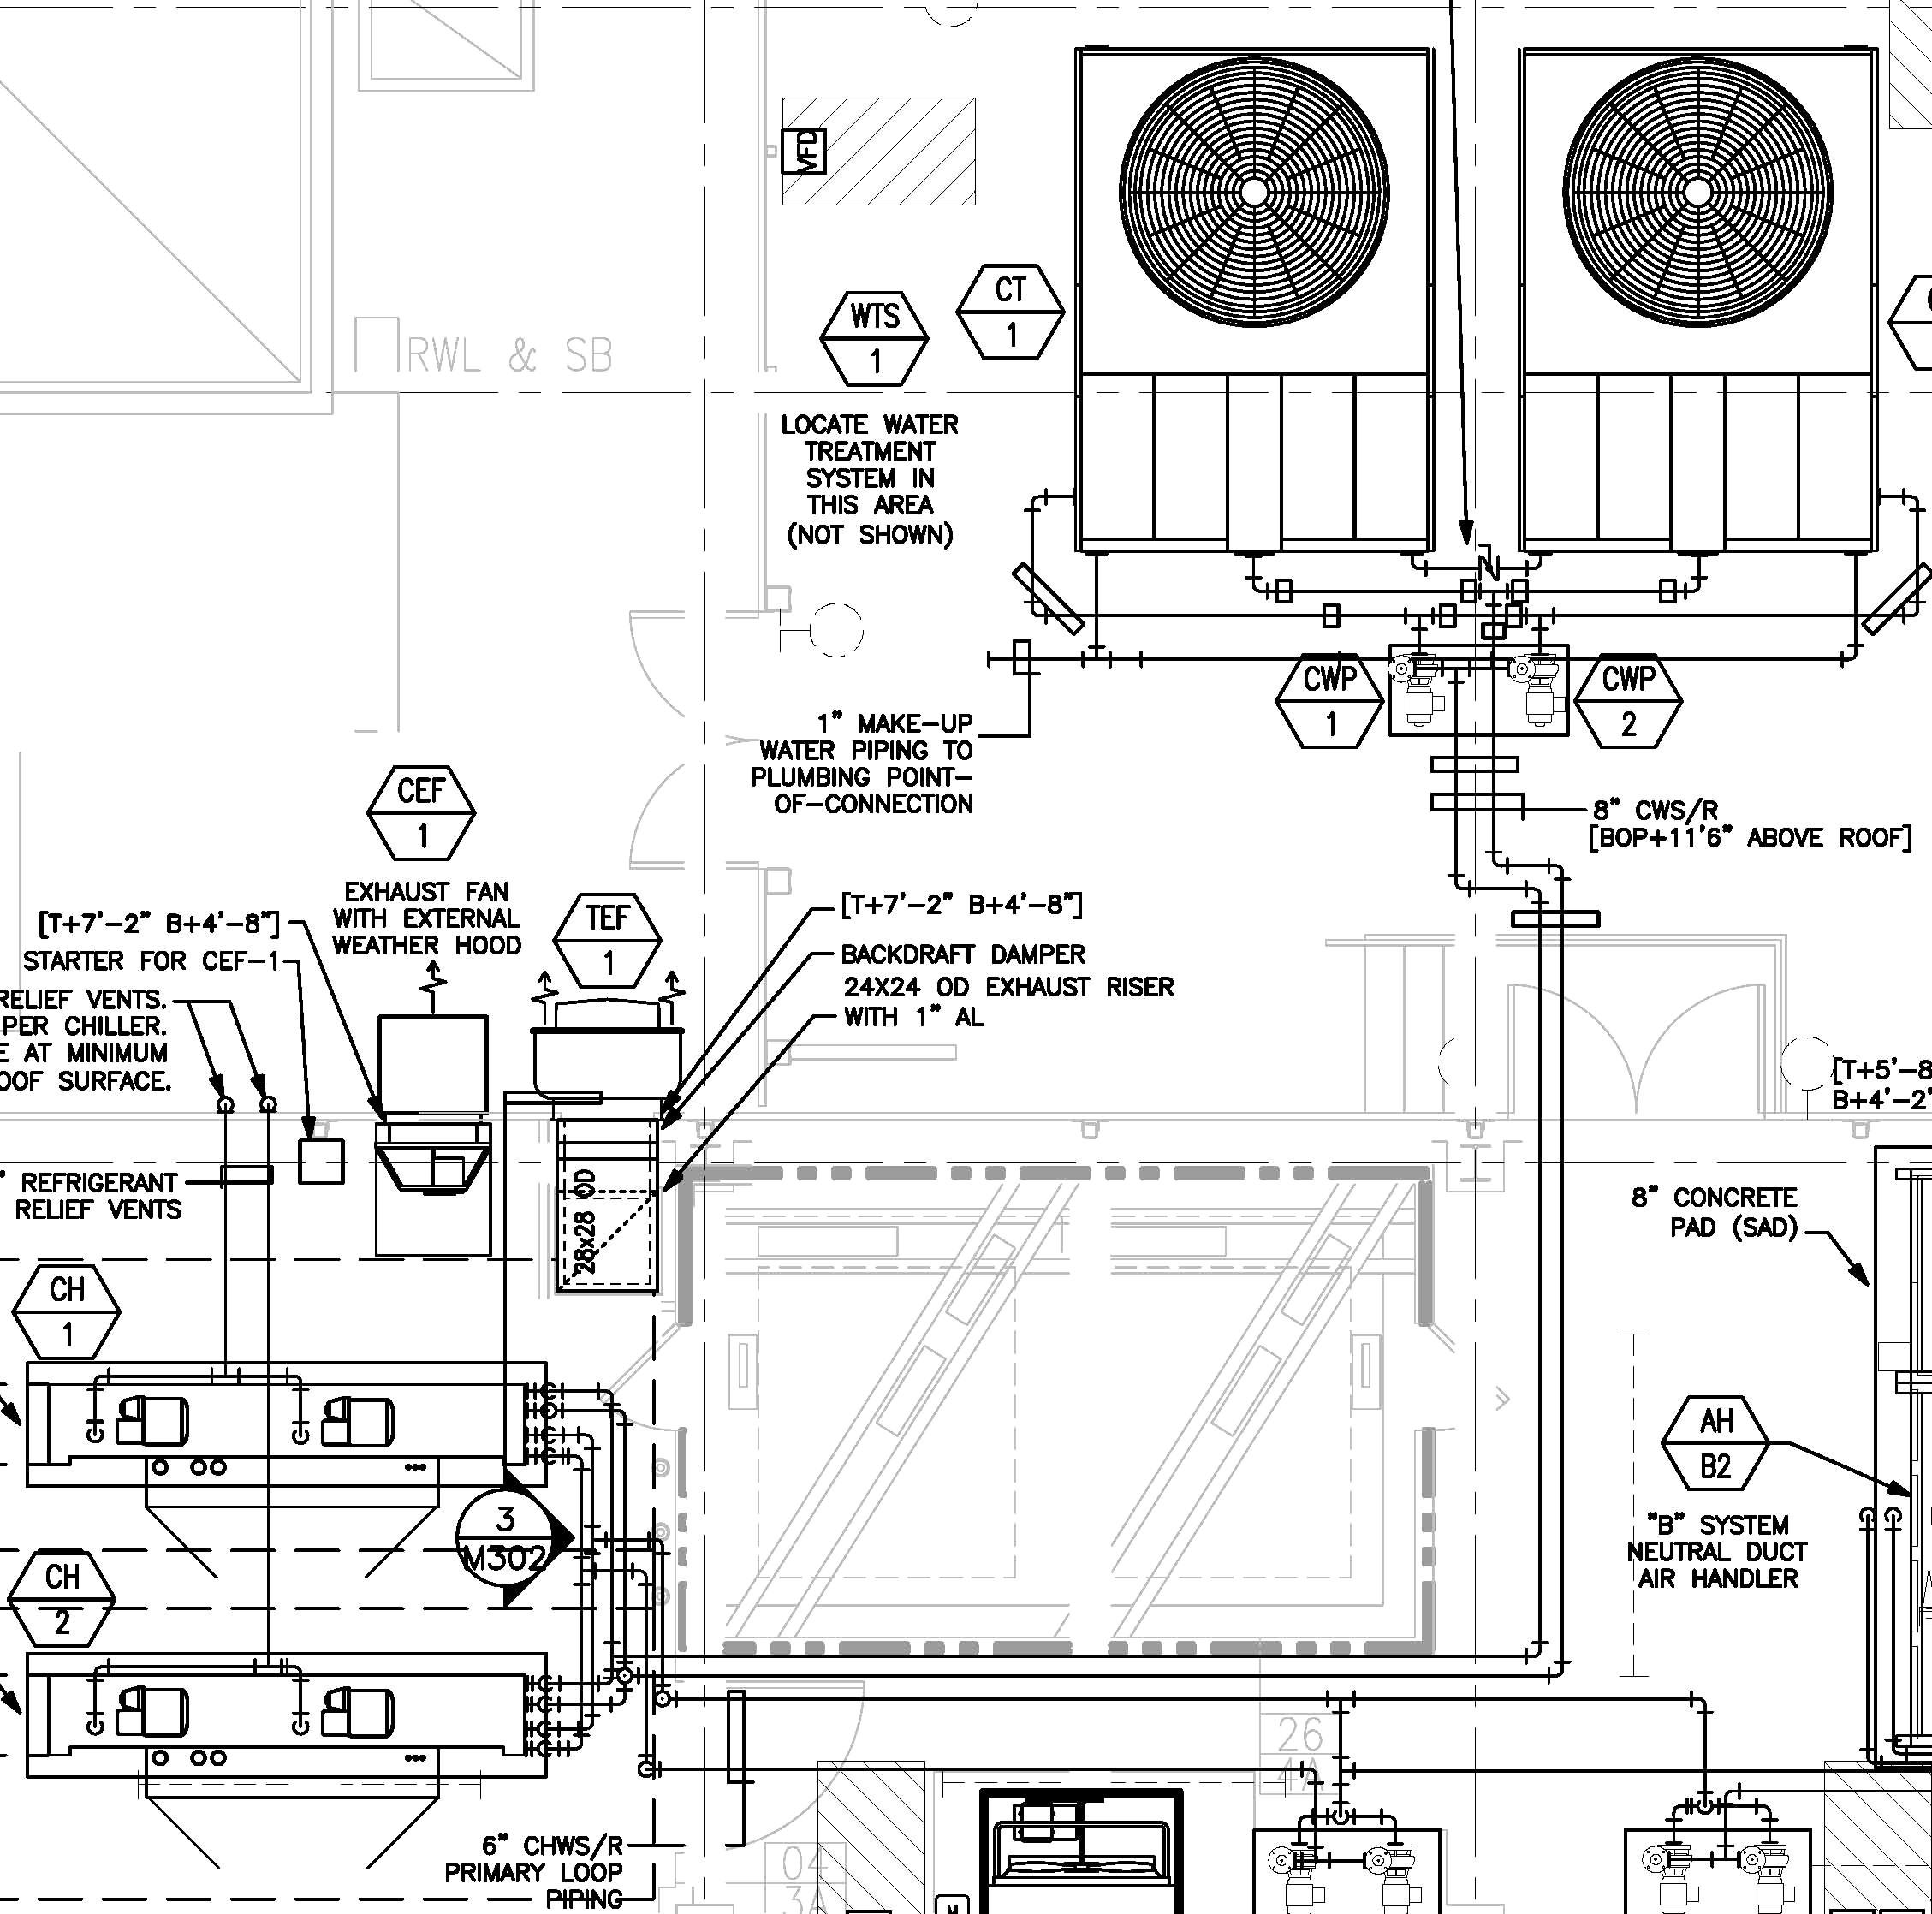 Car Fuel System Diagram Cooling System Diagram sources Of Car Fuel System Diagram